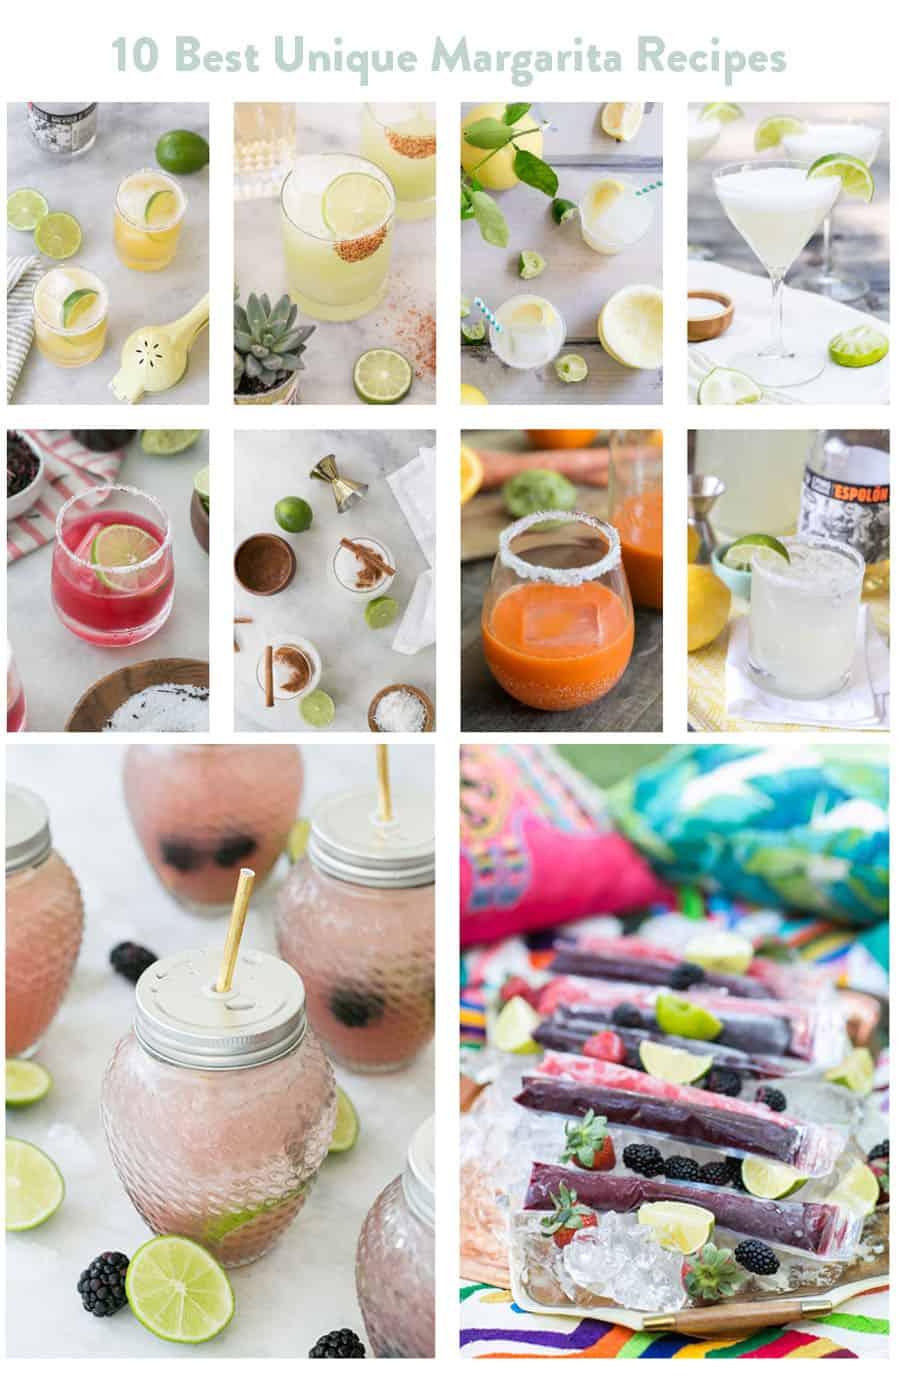 10 photos of margaritas